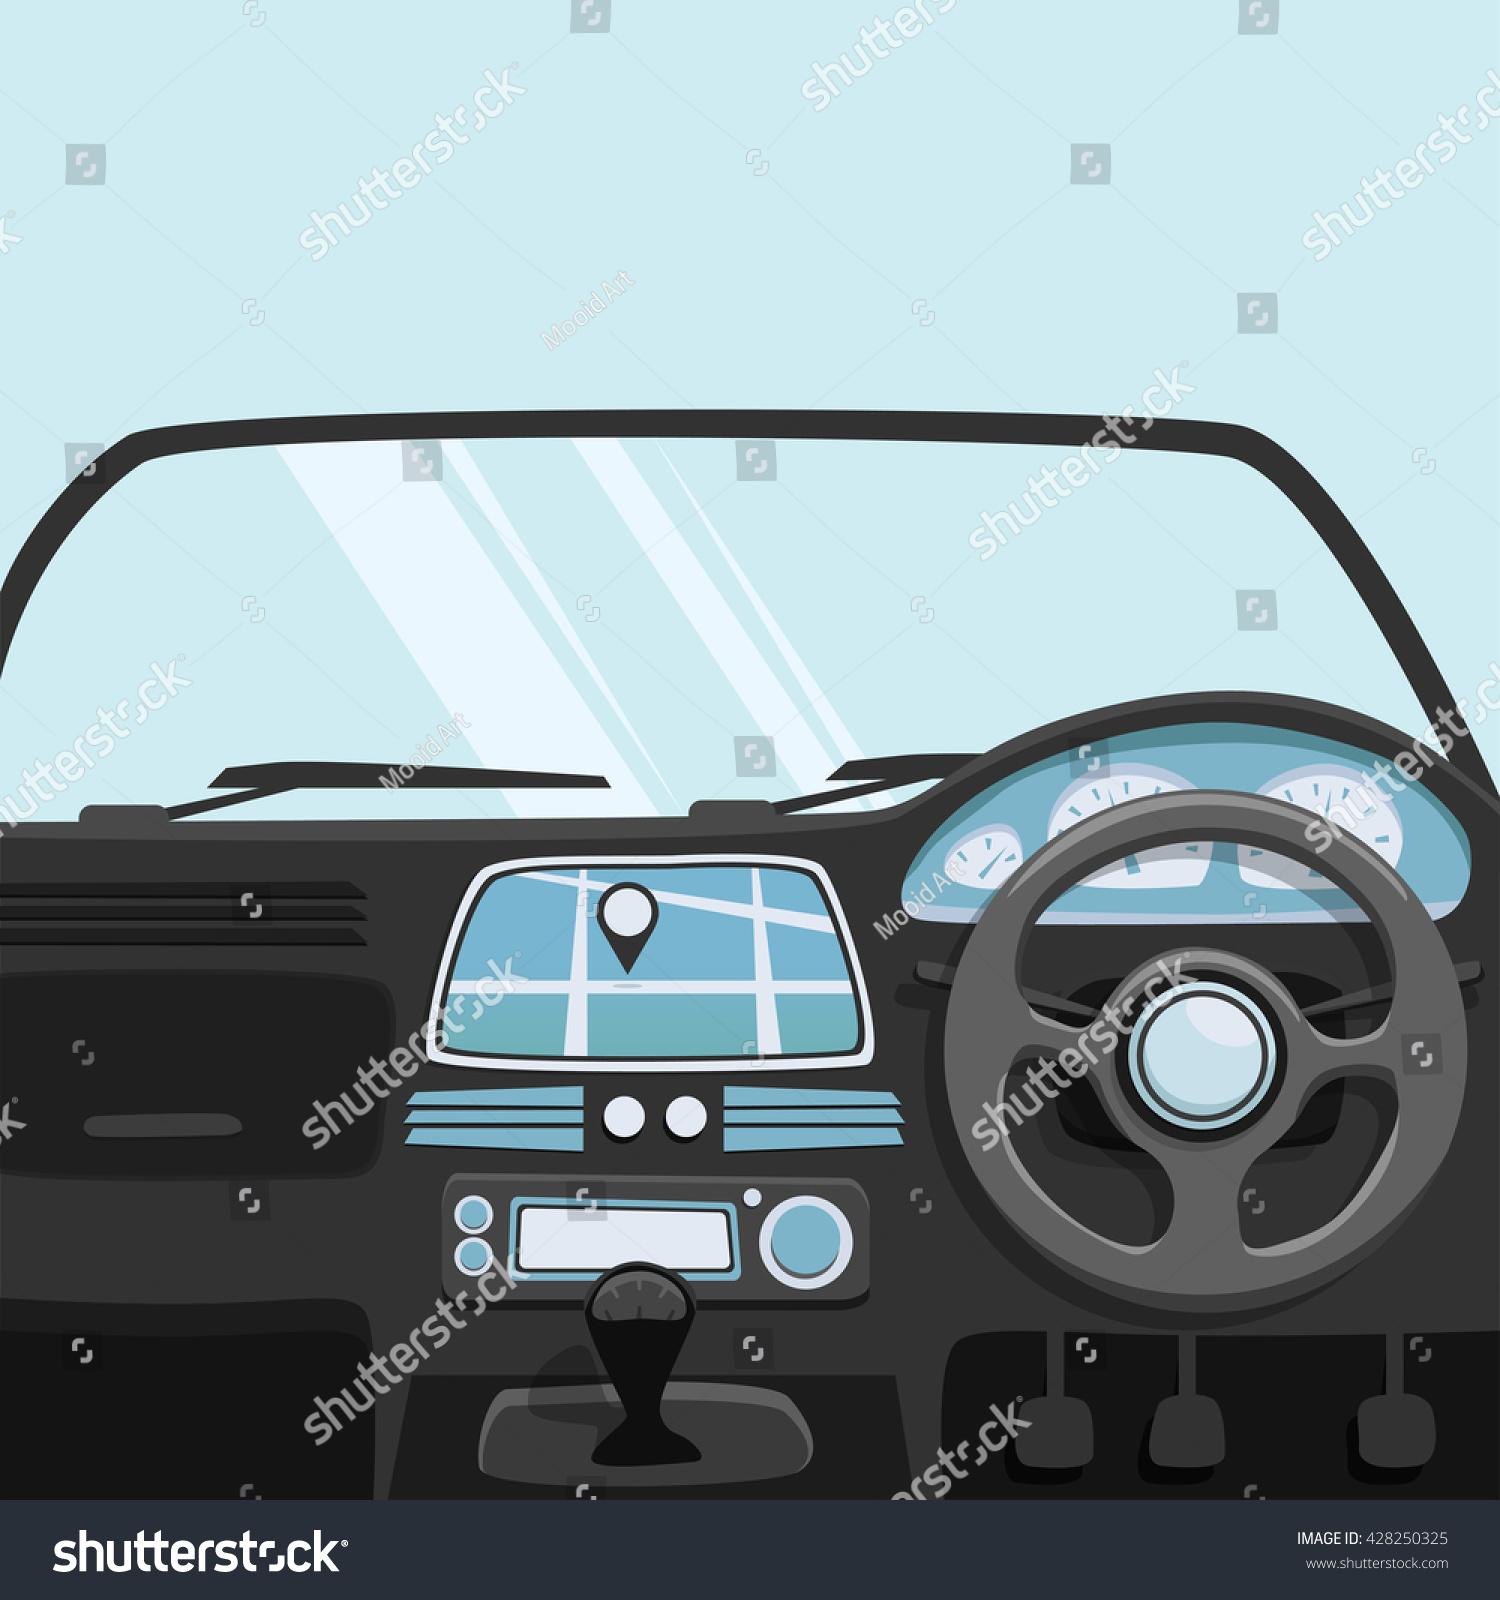 vehicle interior inside car vector cartoon stock vector 428250325 shutterstock. Black Bedroom Furniture Sets. Home Design Ideas